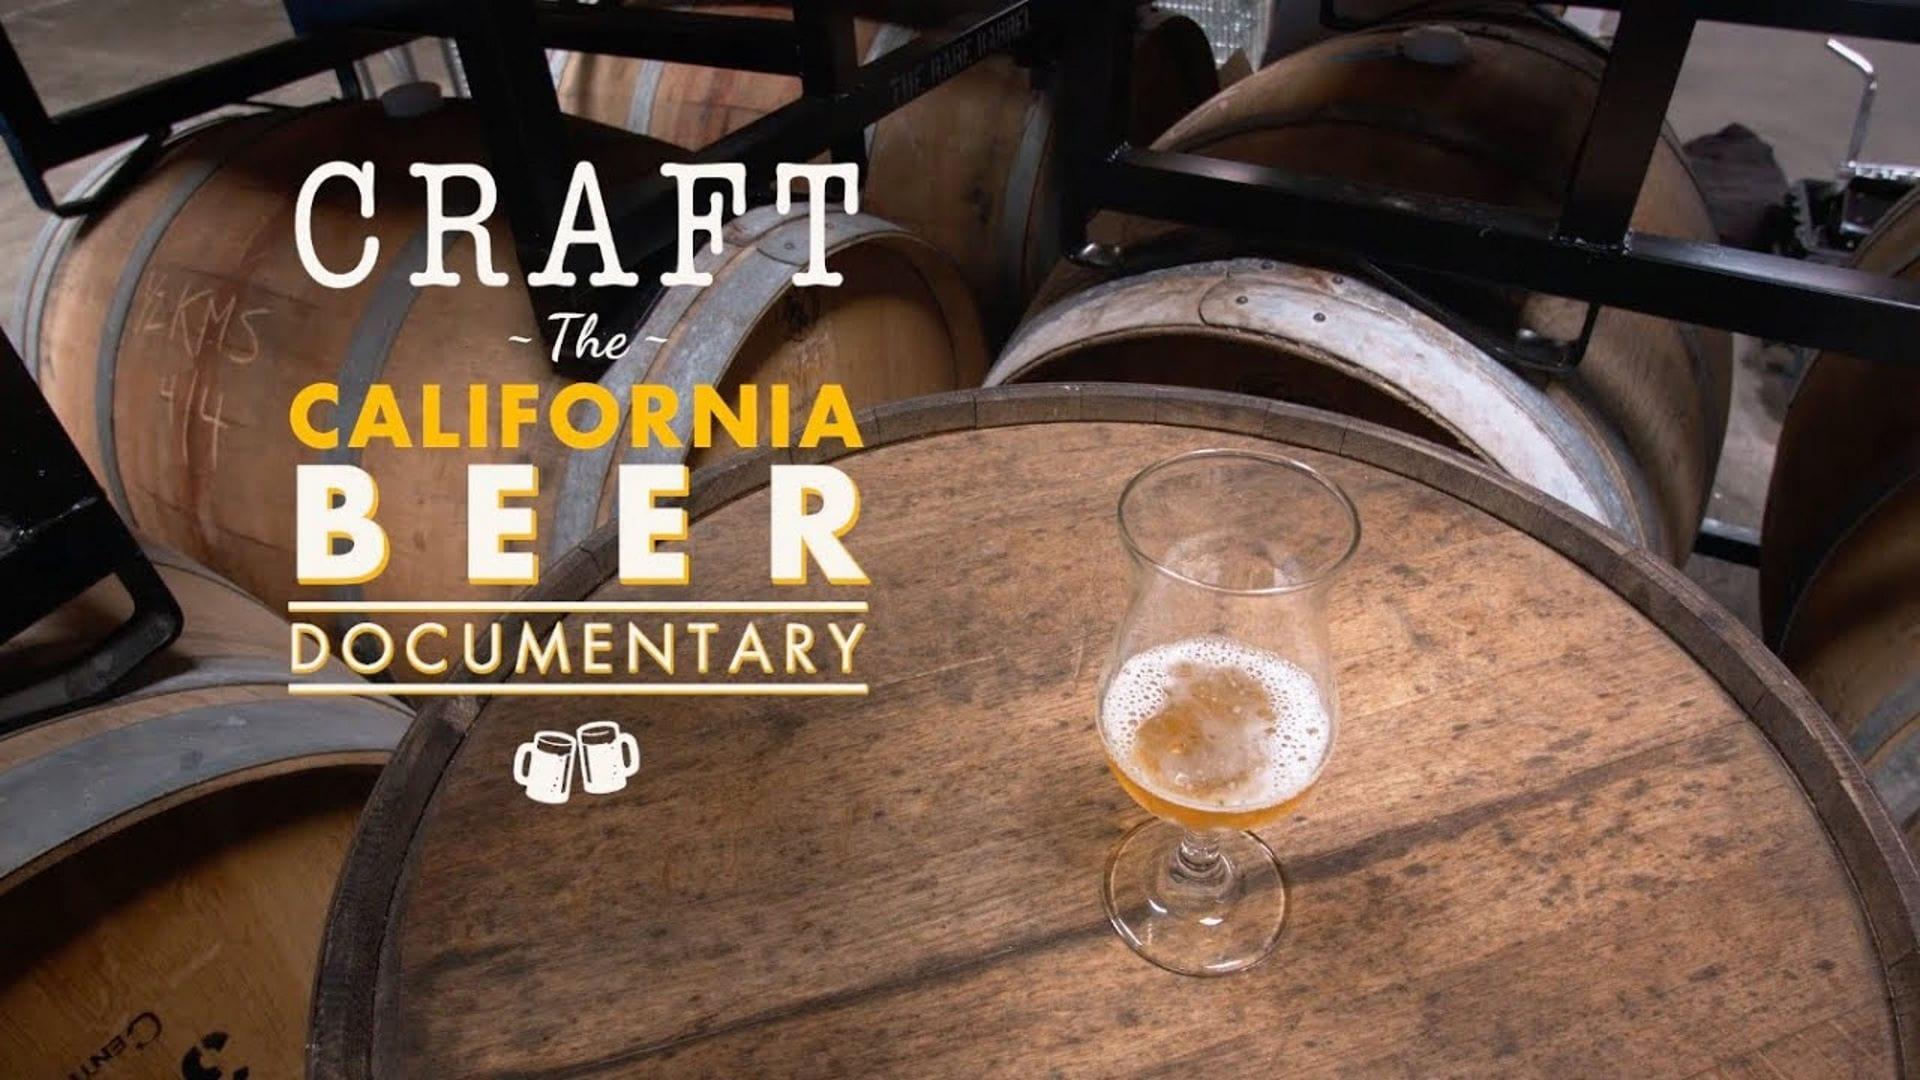 Craft: The California Beer Documentary